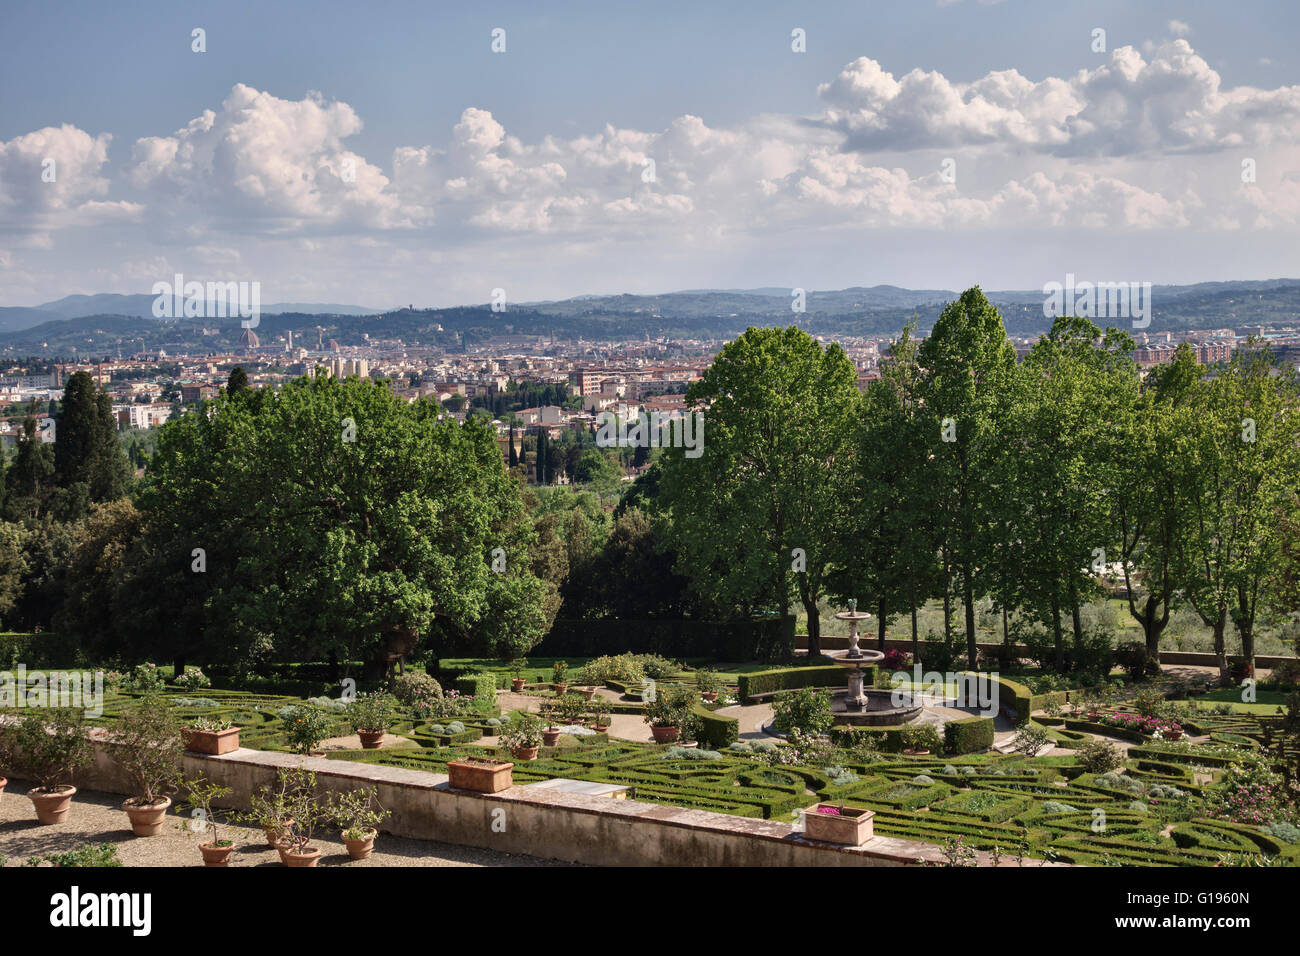 Florence, Italy. Medici Villa della Petraia (La Petraia). The formal terraced gardens overlooking the city Stock Photo